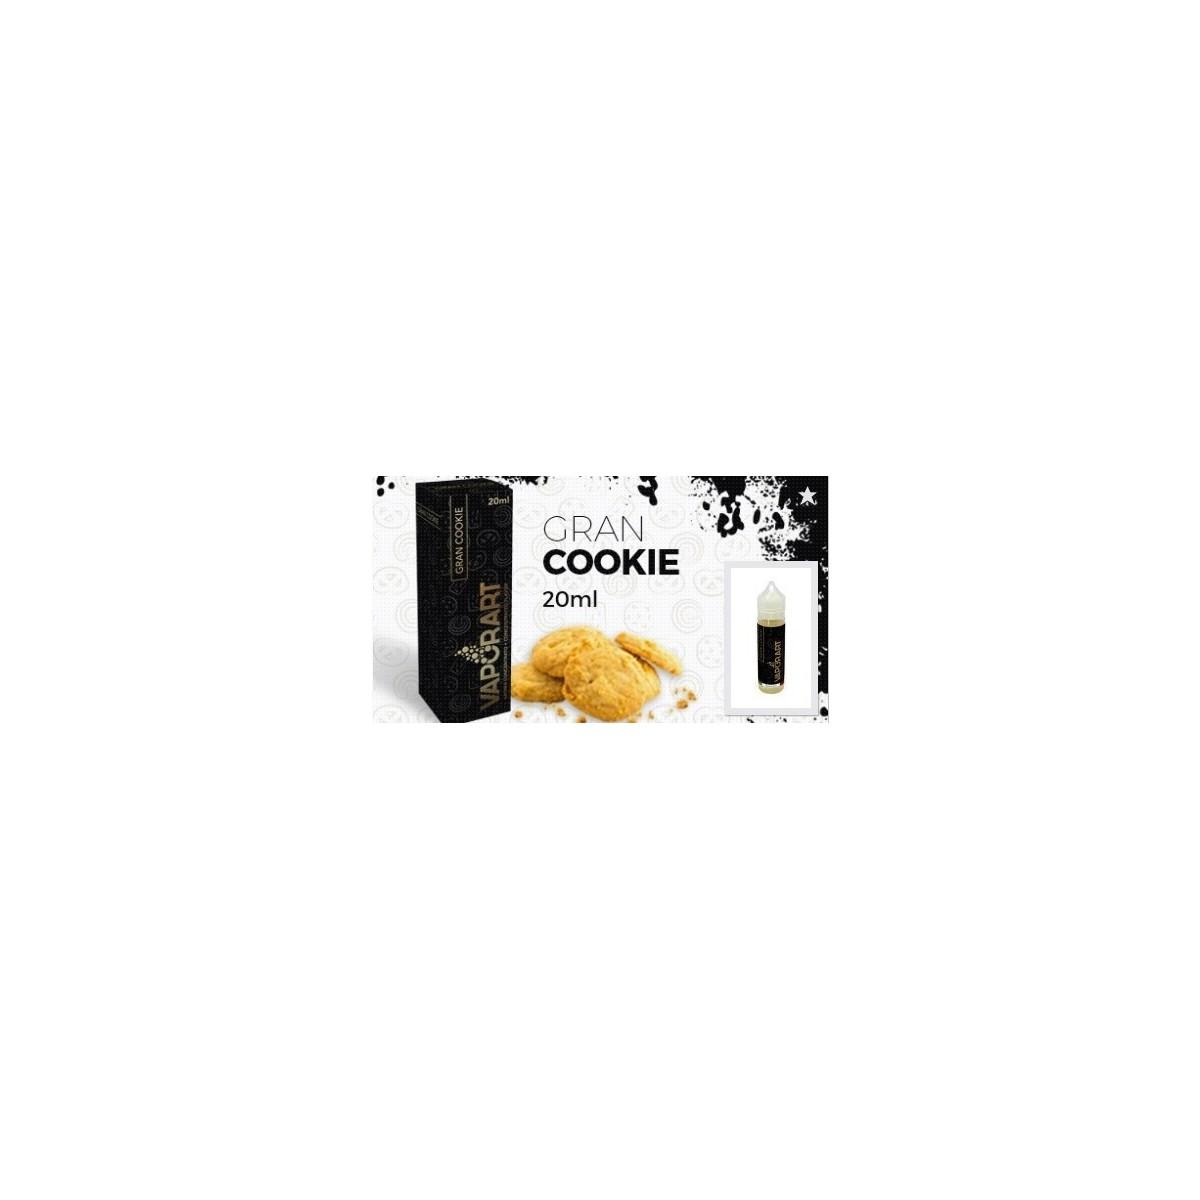 Gran Cookie - Formato scomposto concentr. 20ml - Vaporart